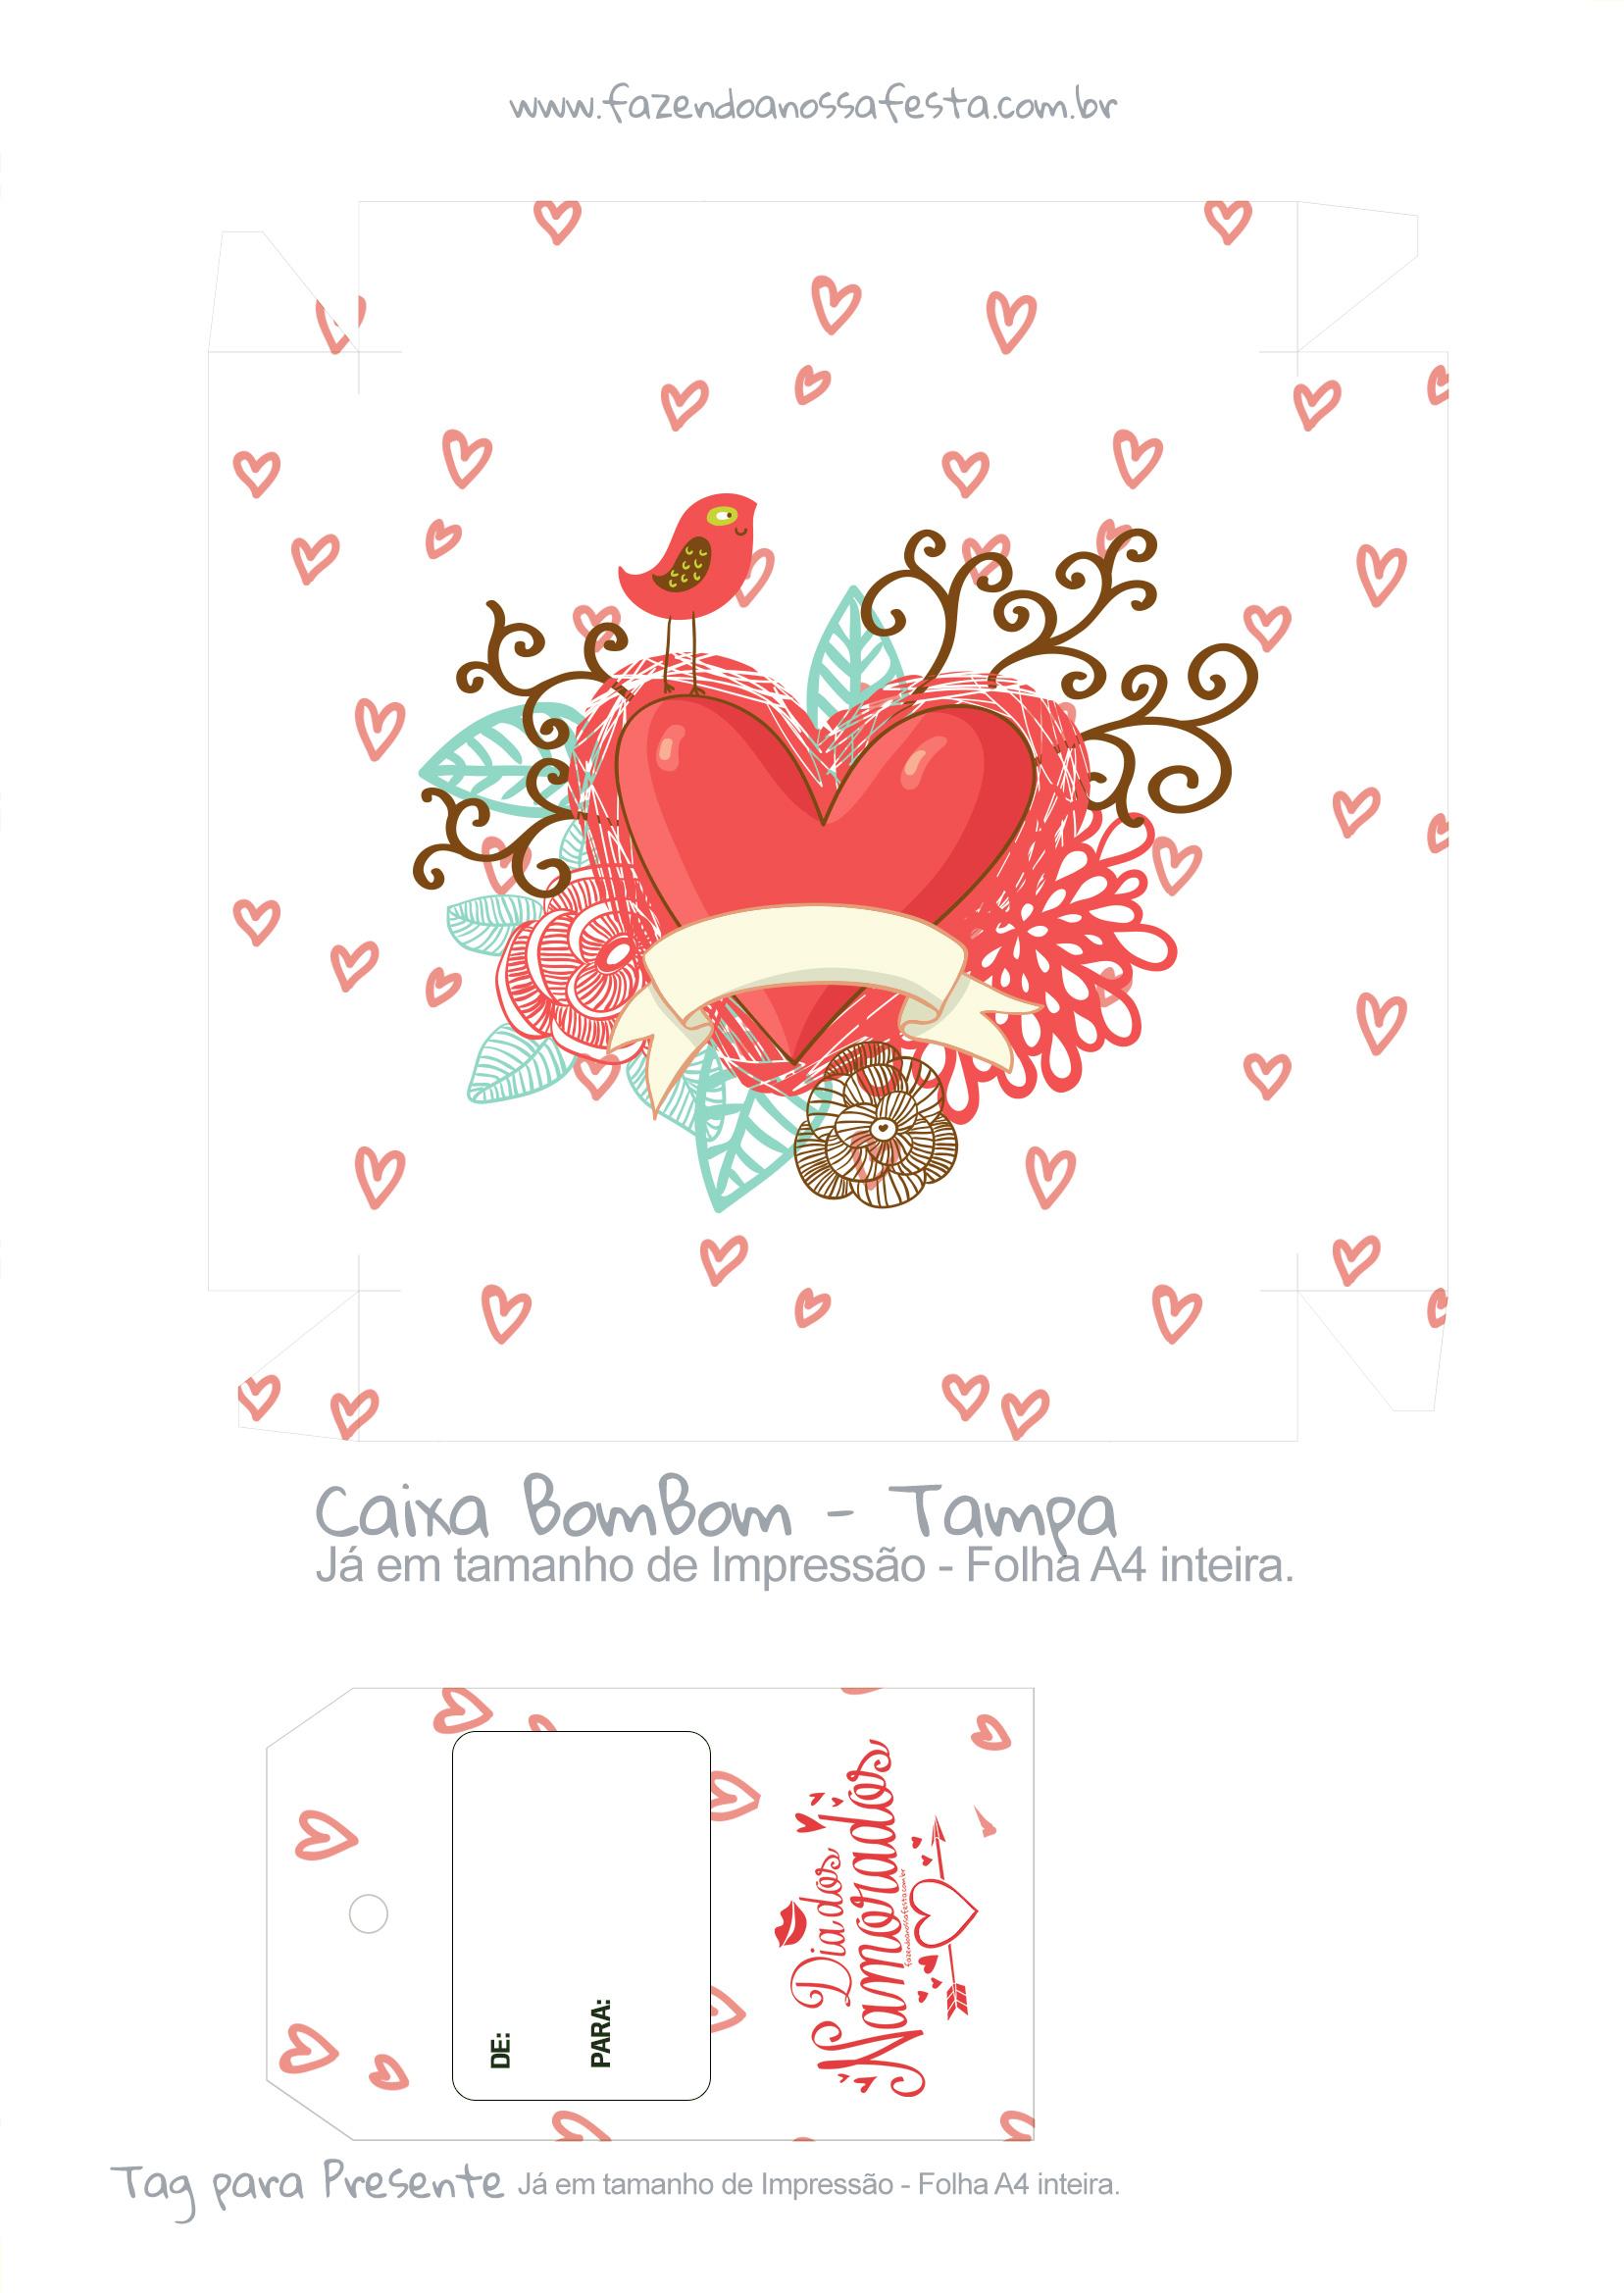 Caixa Bombom Dia dos Namorados Coracao - parte 1